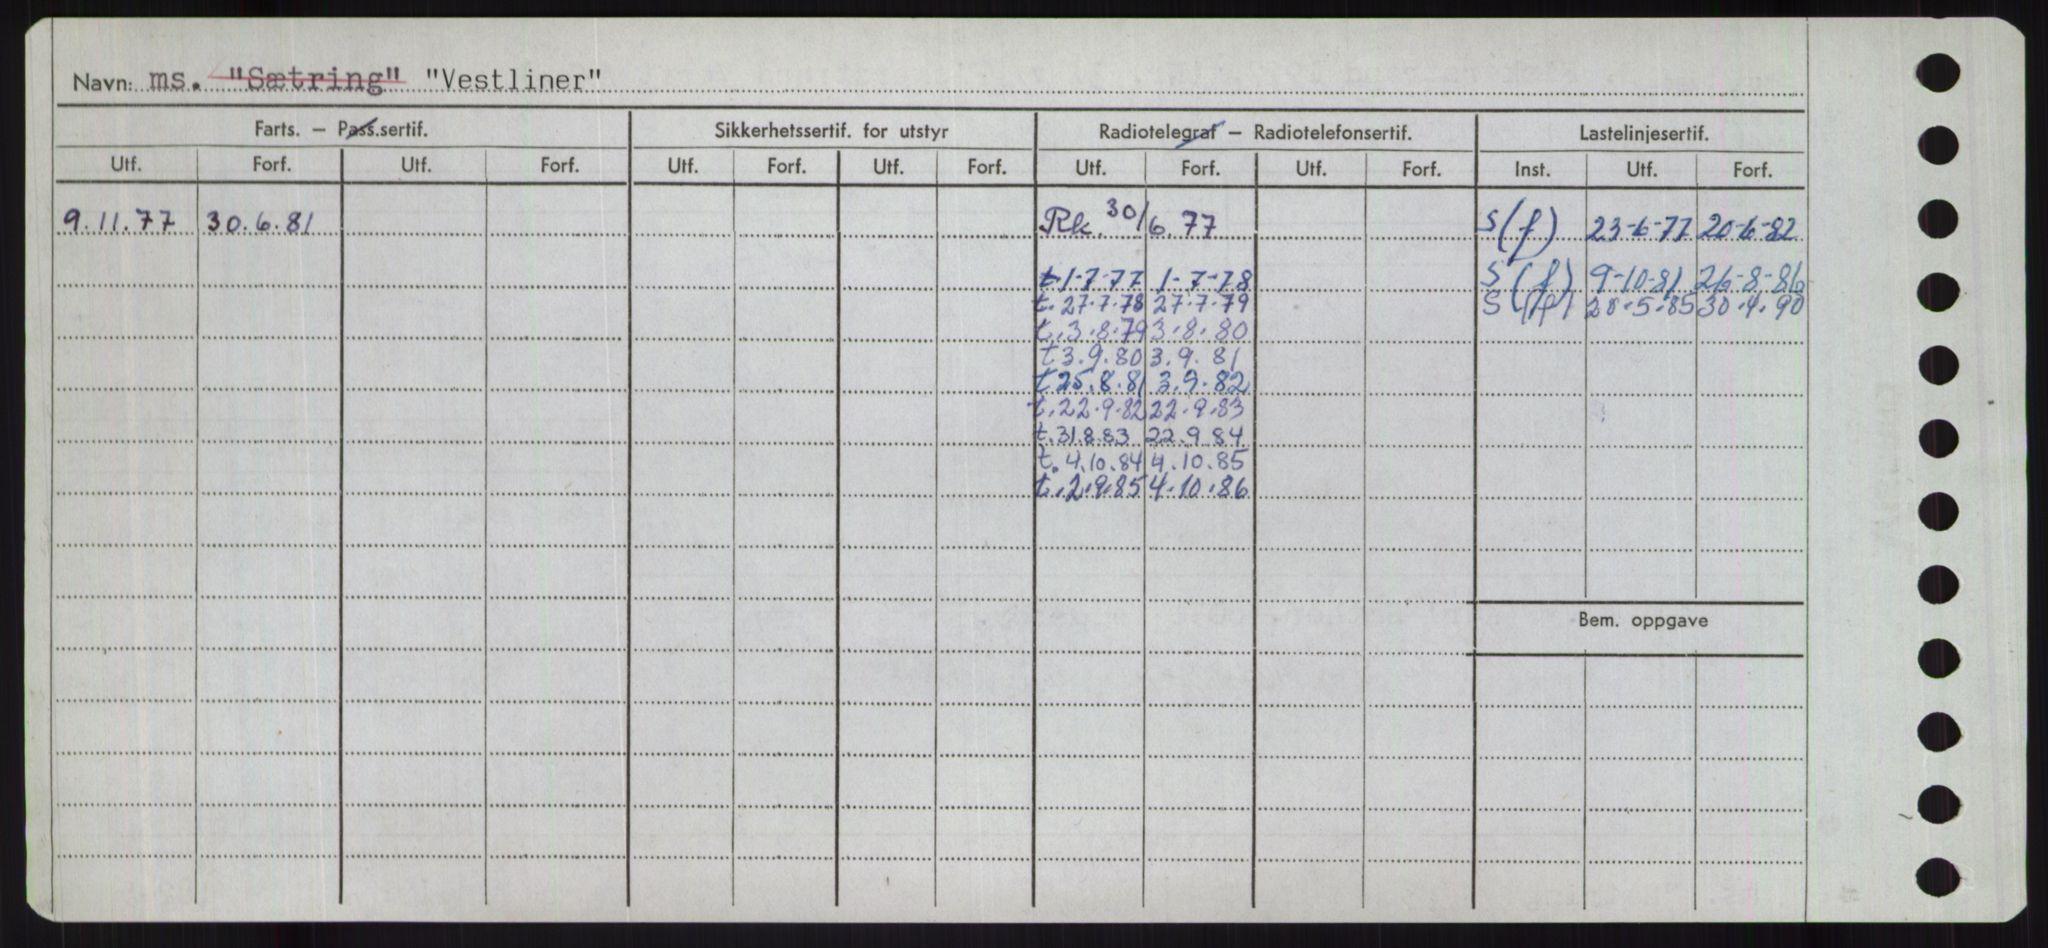 RA, Sjøfartsdirektoratet med forløpere, Skipsmålingen, H/Ha/L0006: Fartøy, Sver-Å, s. 344